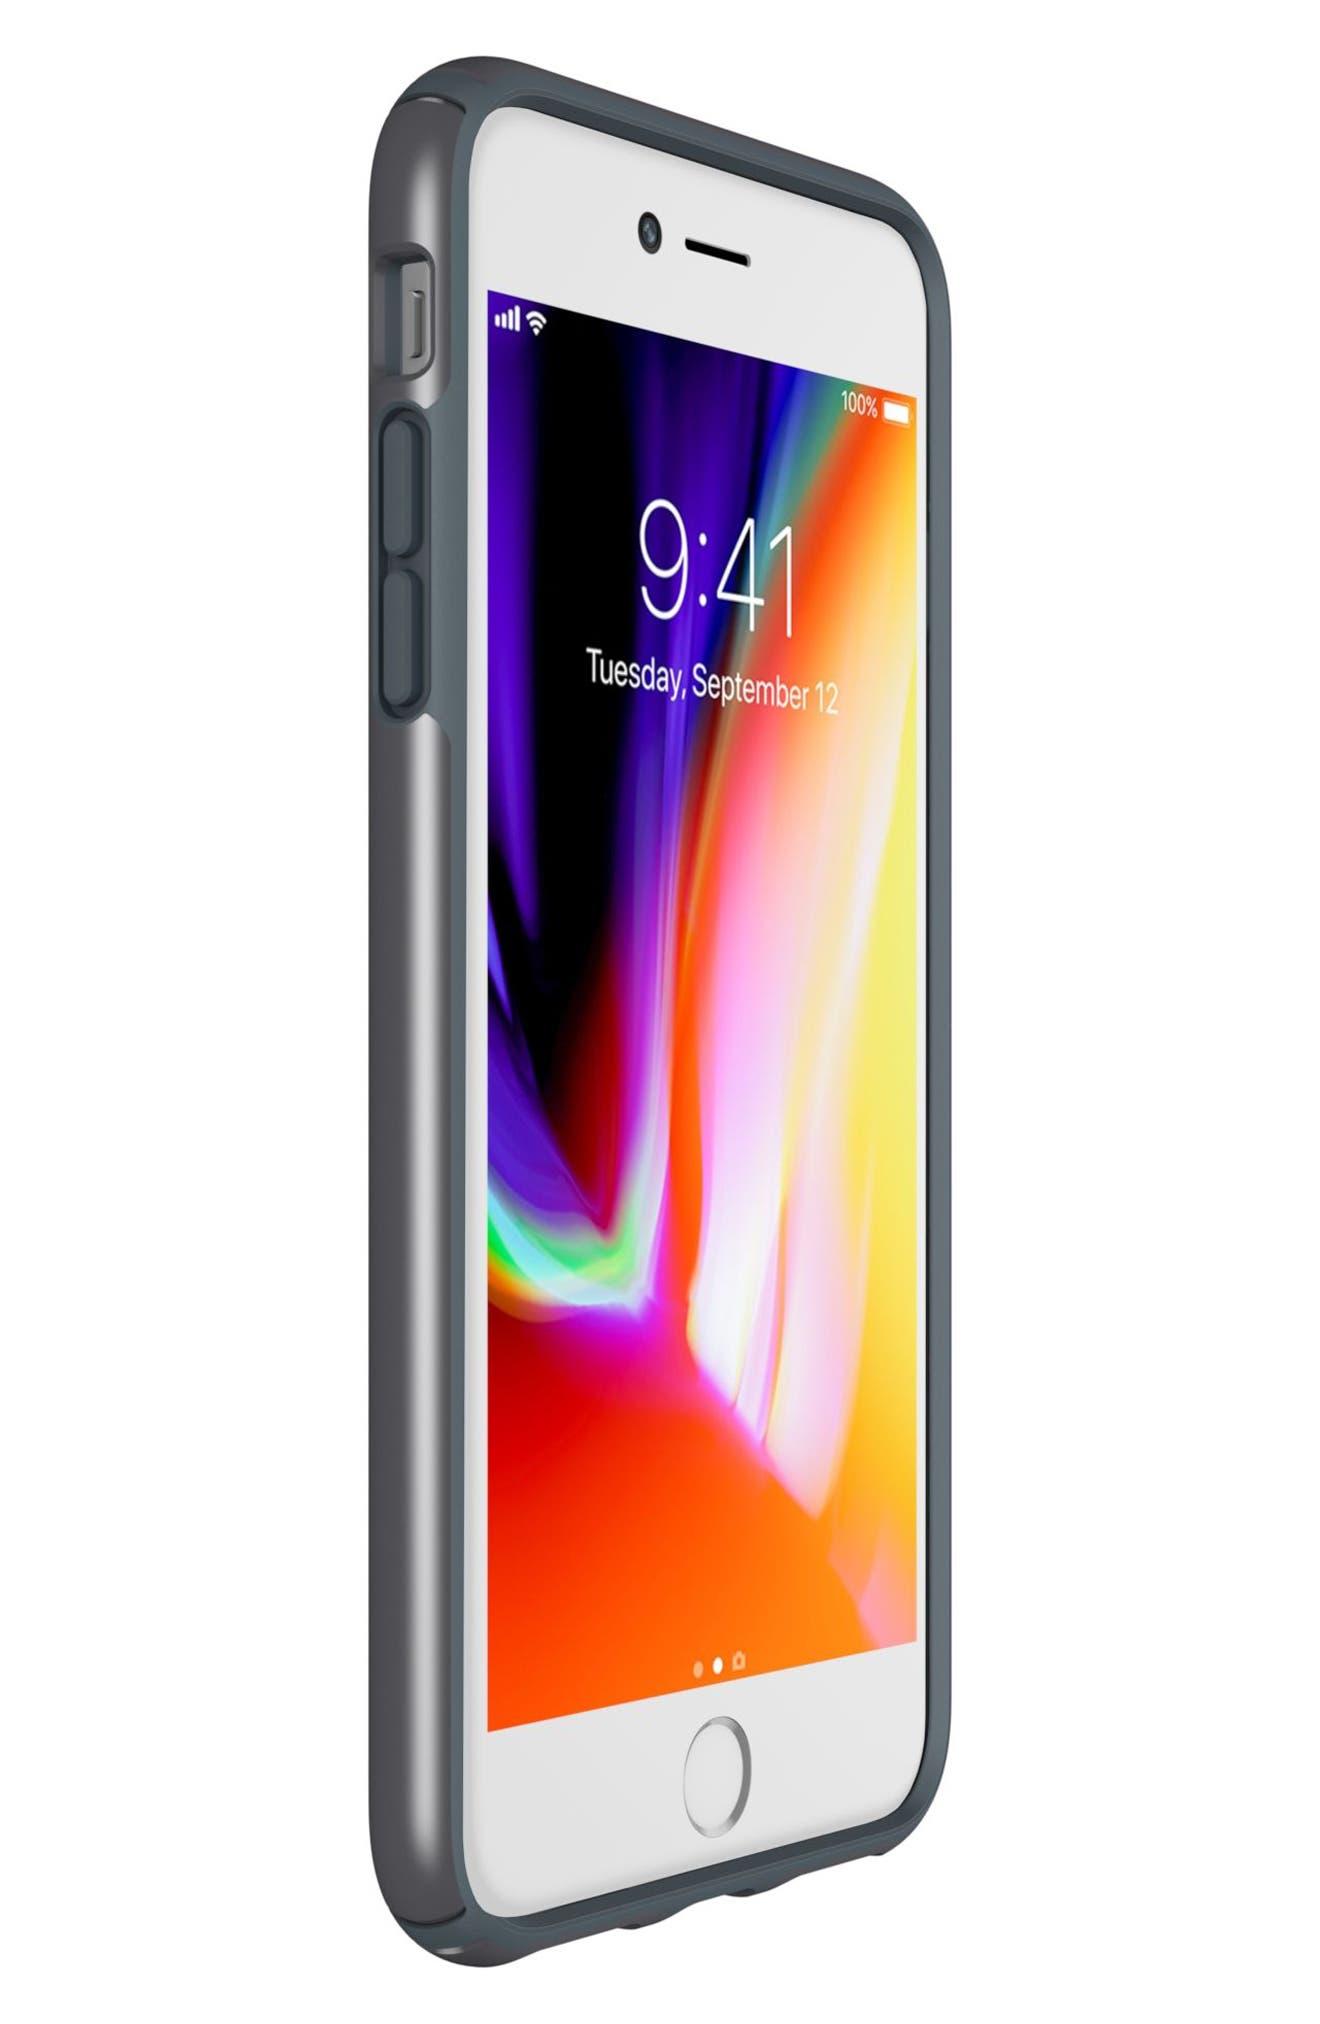 iPhone 6/6s/7/8 Case,                             Alternate thumbnail 7, color,                             Tungsten Grey Metallic/ Grey